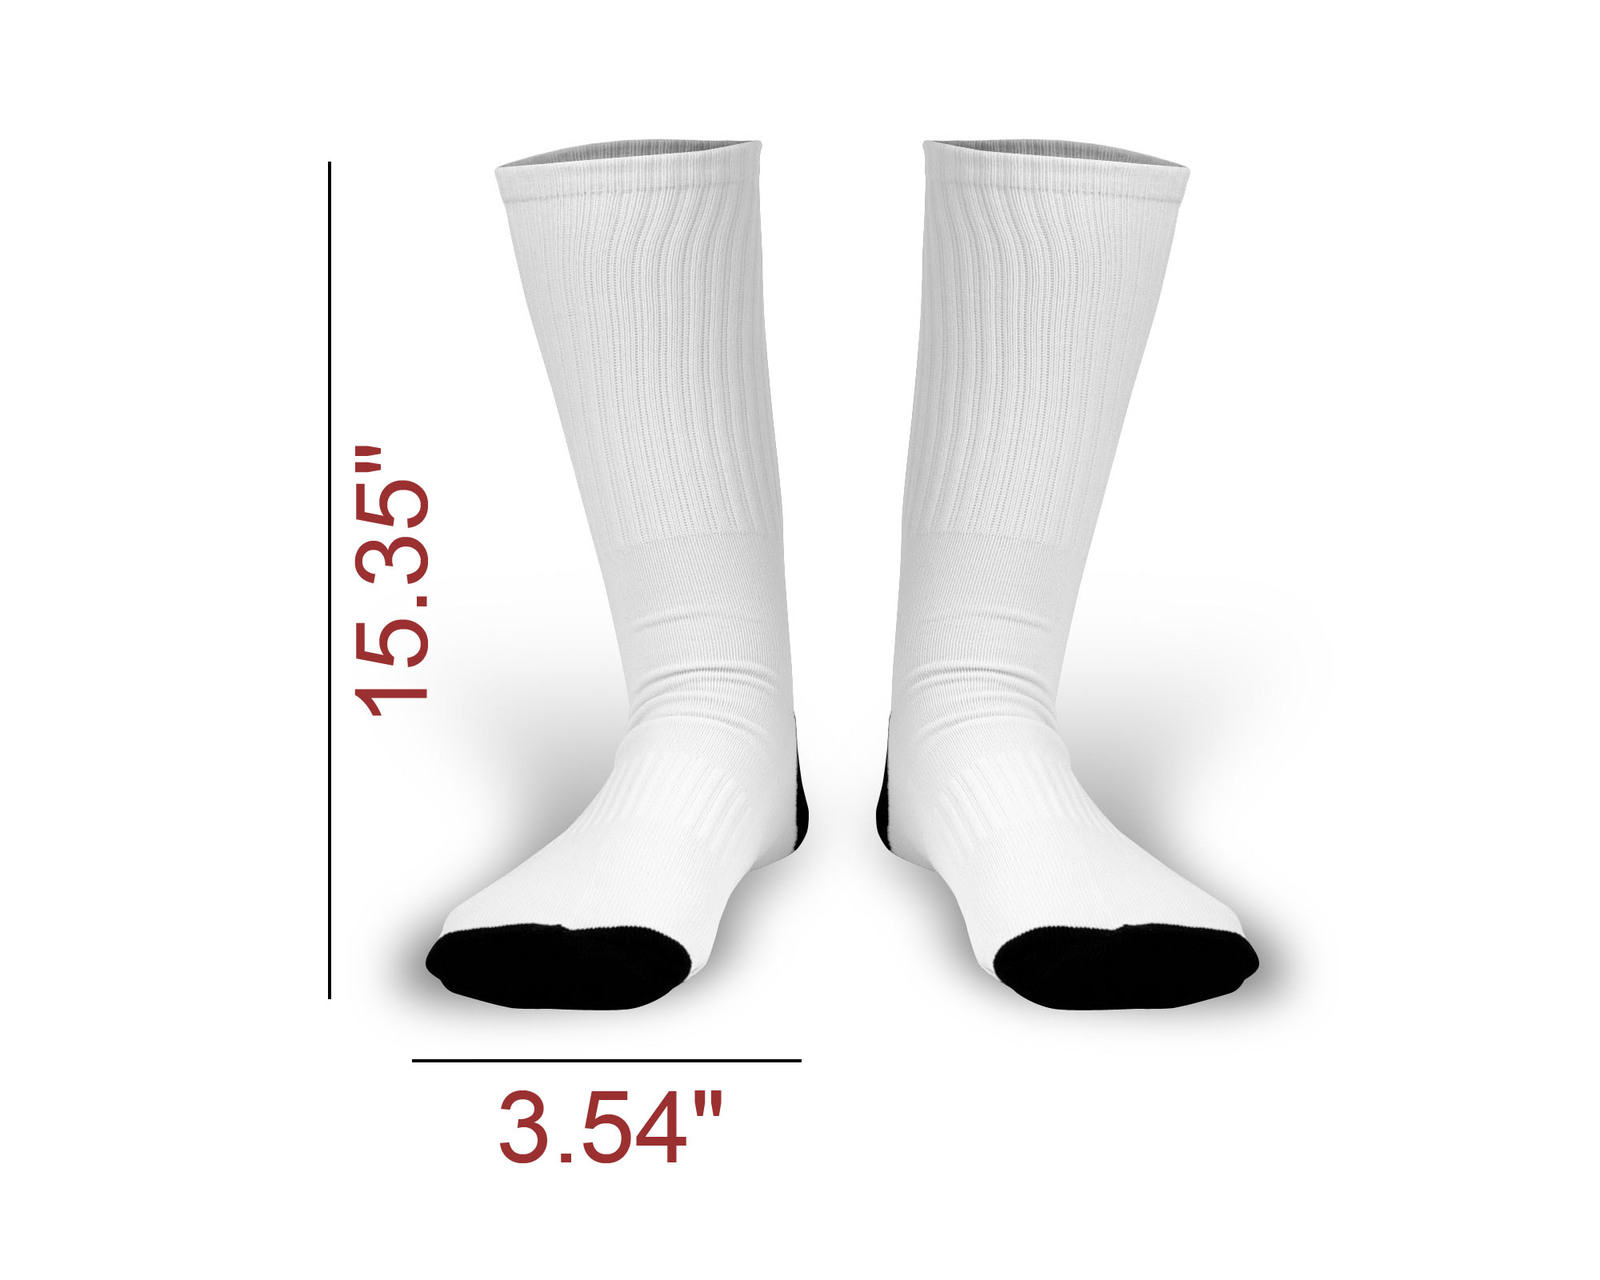 Panda Alpha Omicron Pi Lilly Pulitzer Sock Trouser Socks